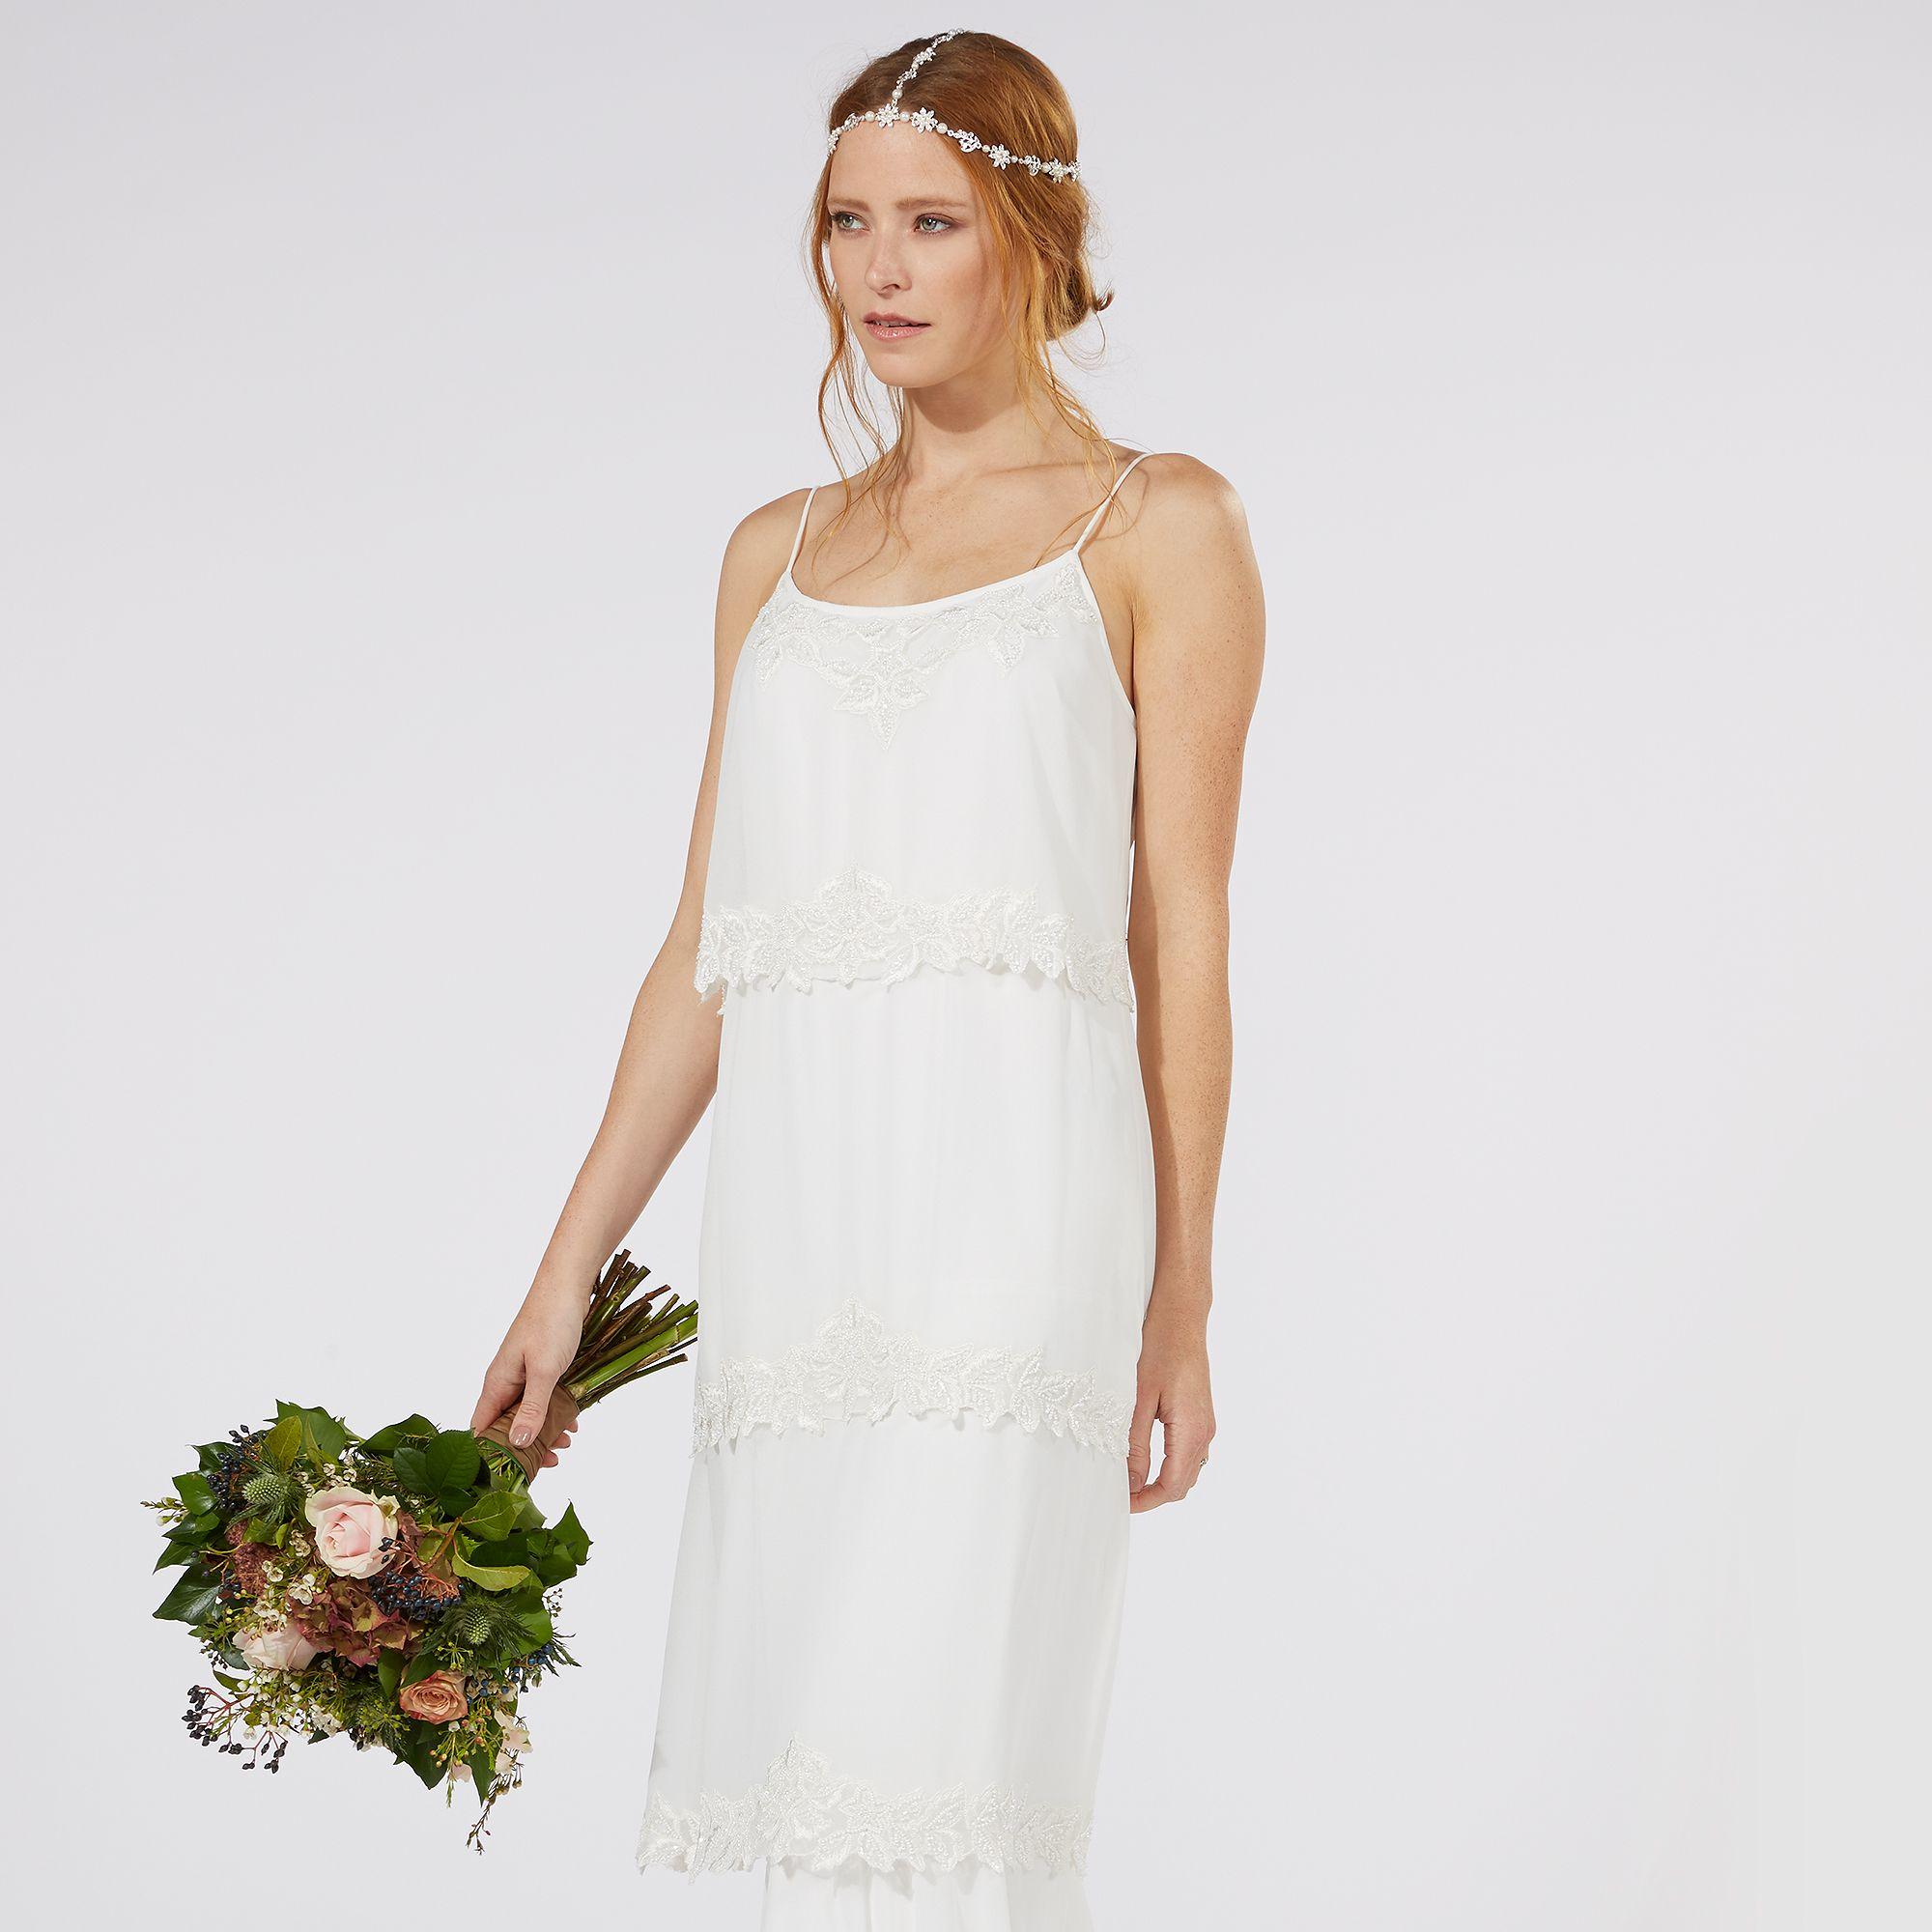 Modern Debenhams Wedding Dress Photo - Wedding Dress Ideas - itemver ...